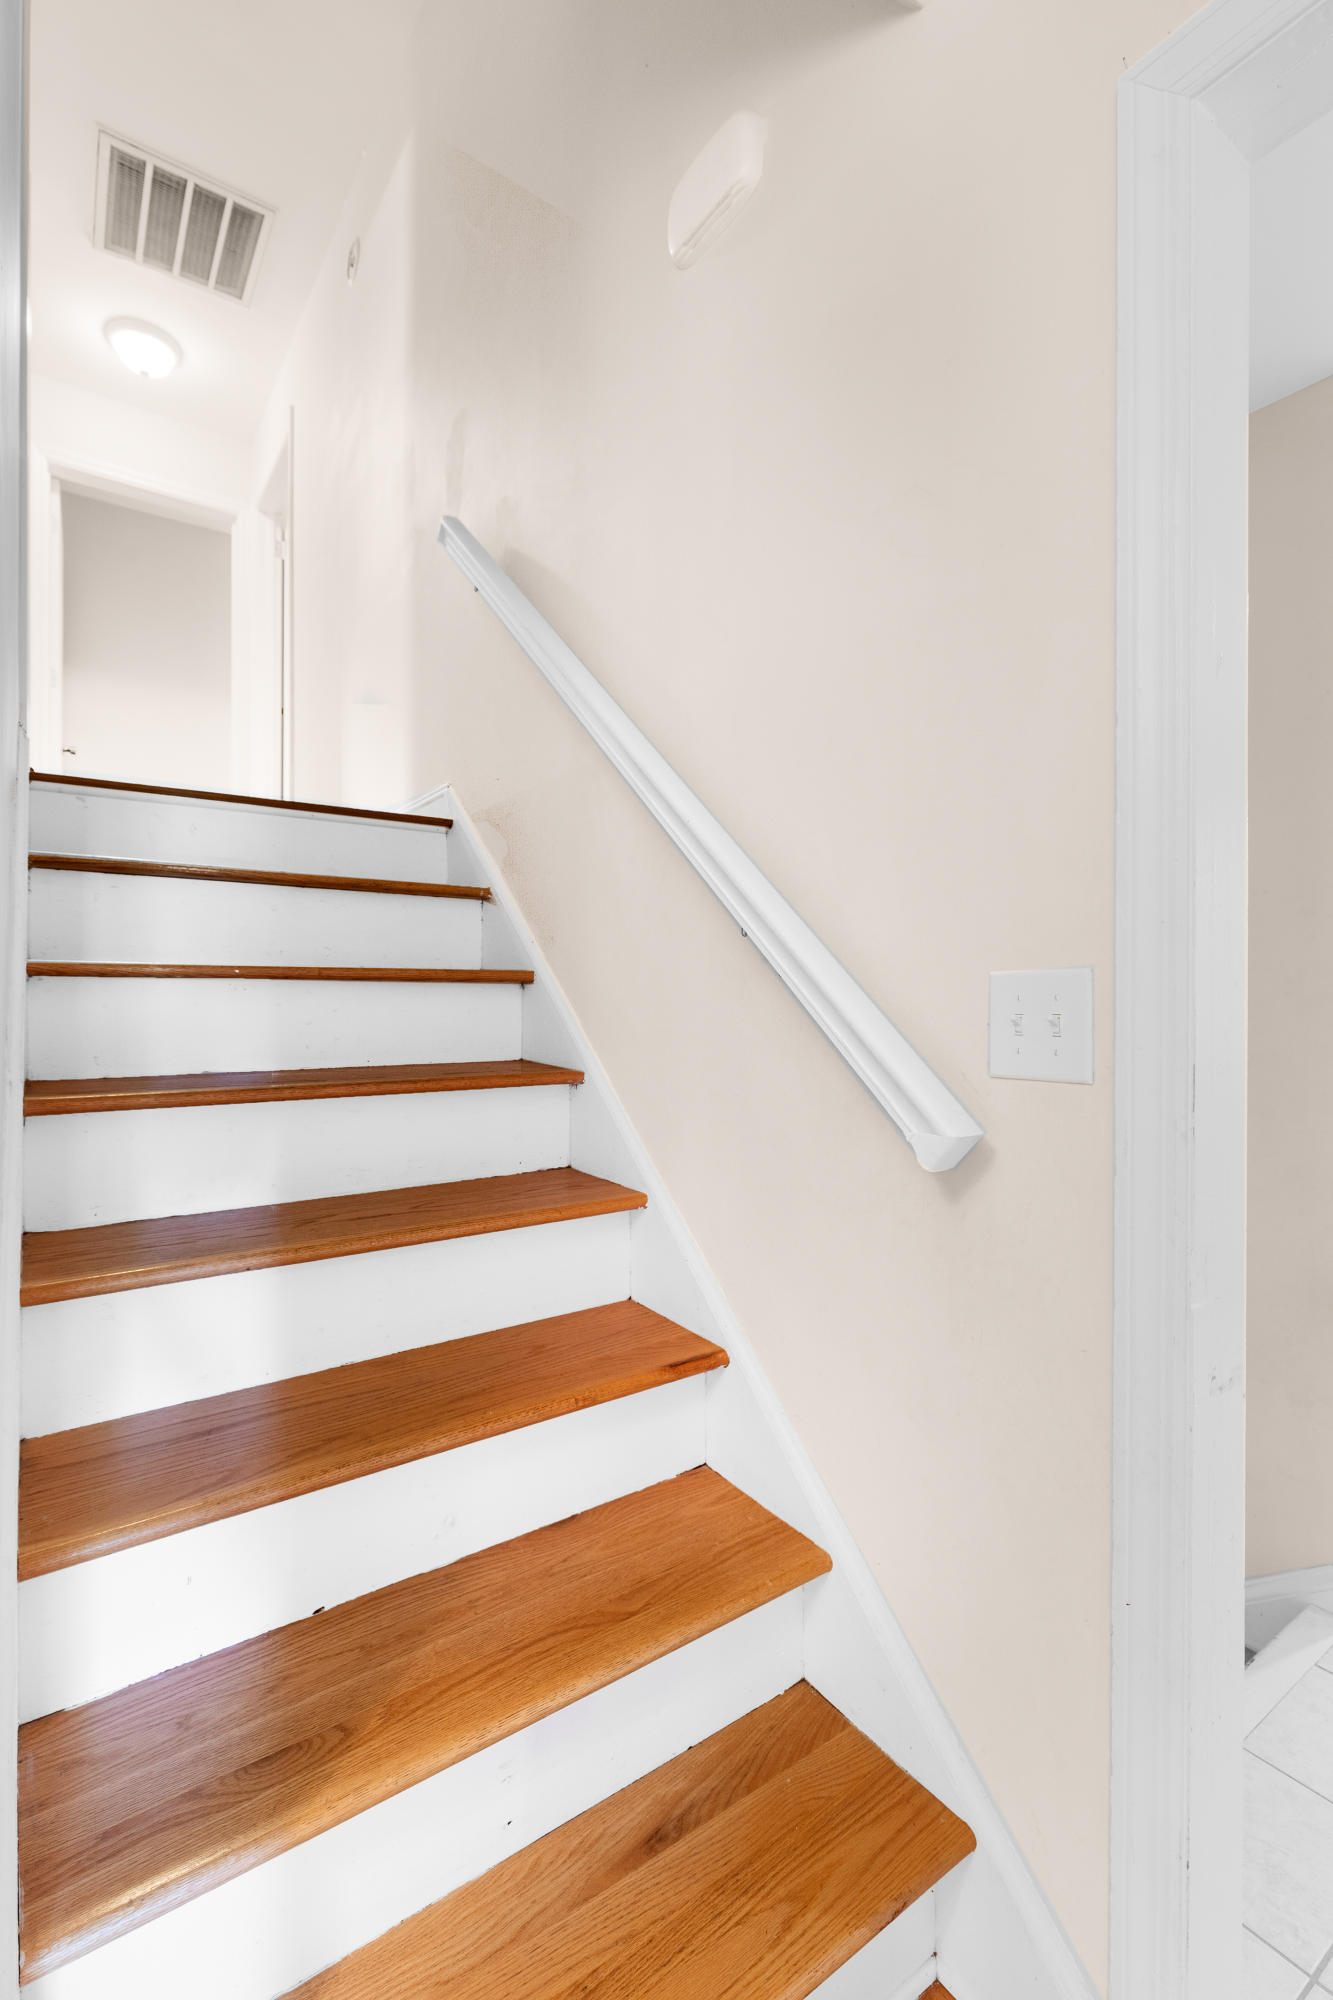 Stiles Point Homes For Sale - 712 London, Charleston, SC - 14